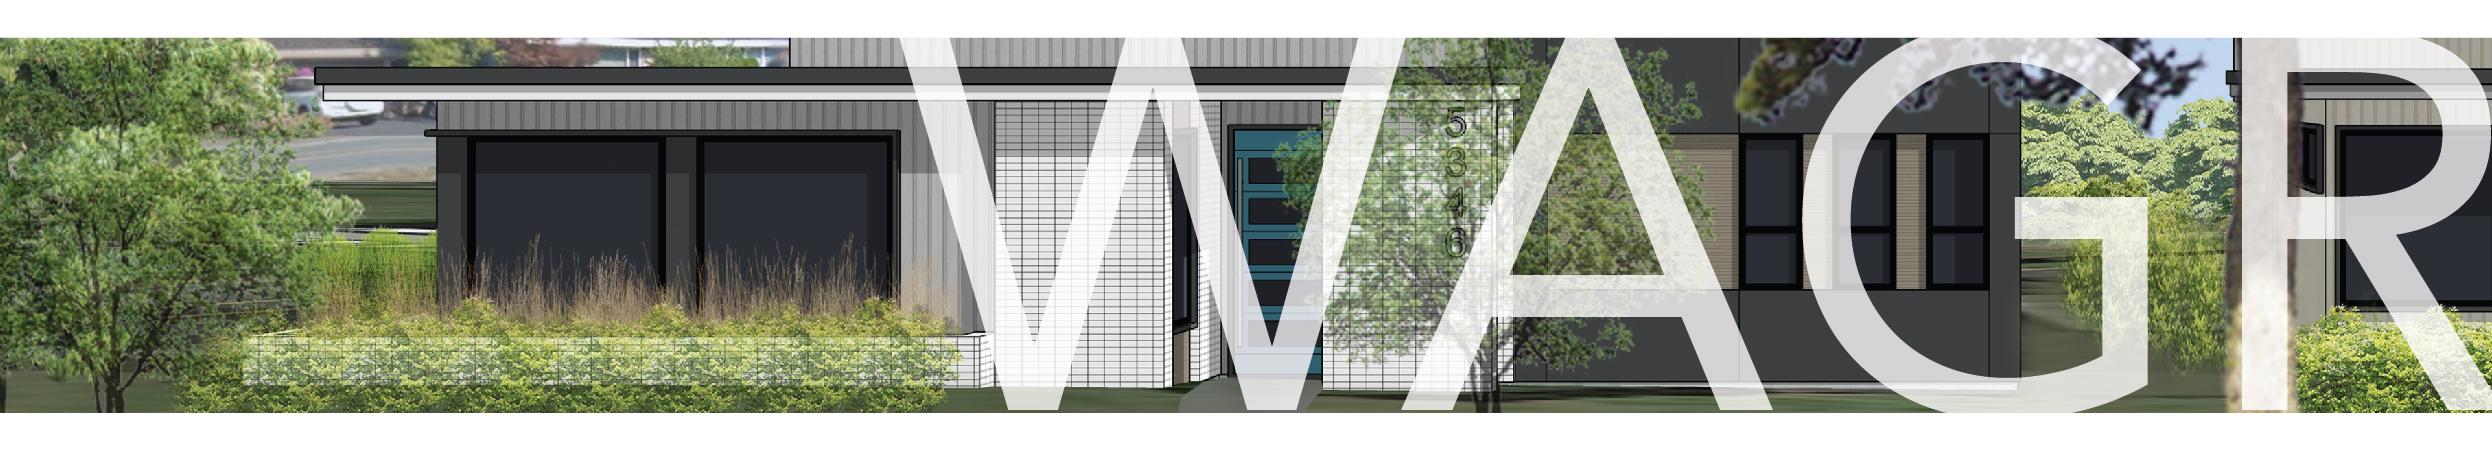 Project Tiles-18.jpg